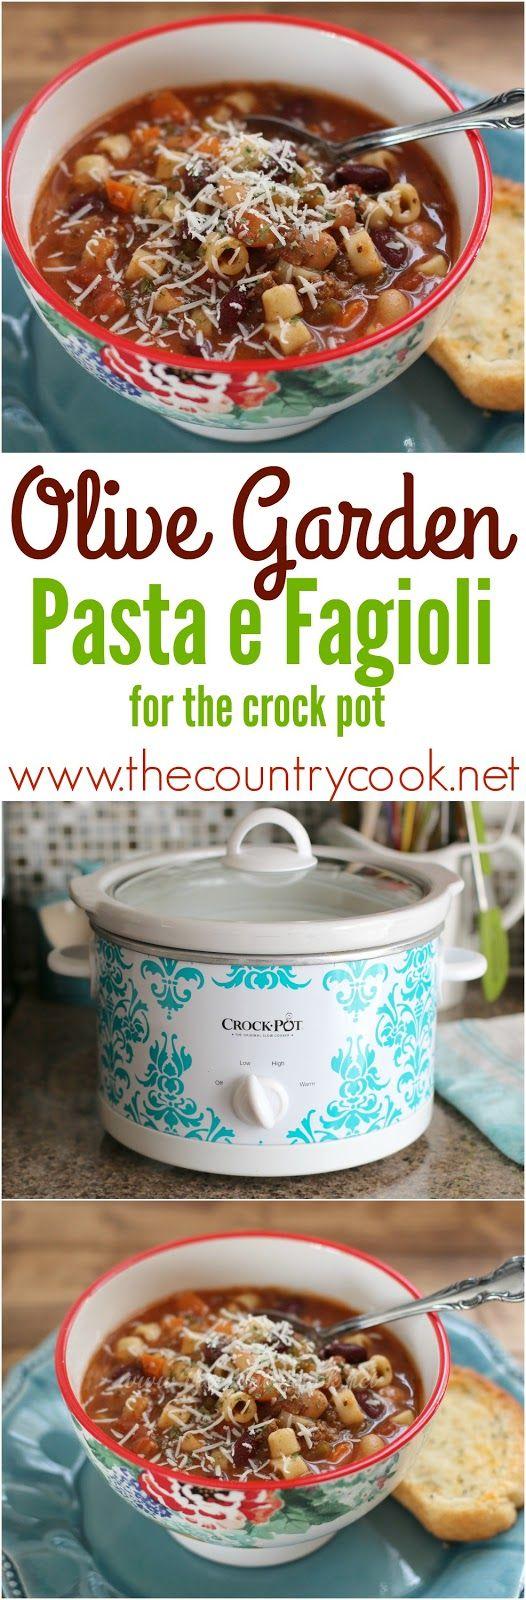 The Country Cook Olive Garden Pasta E Fagioli Soup Crock